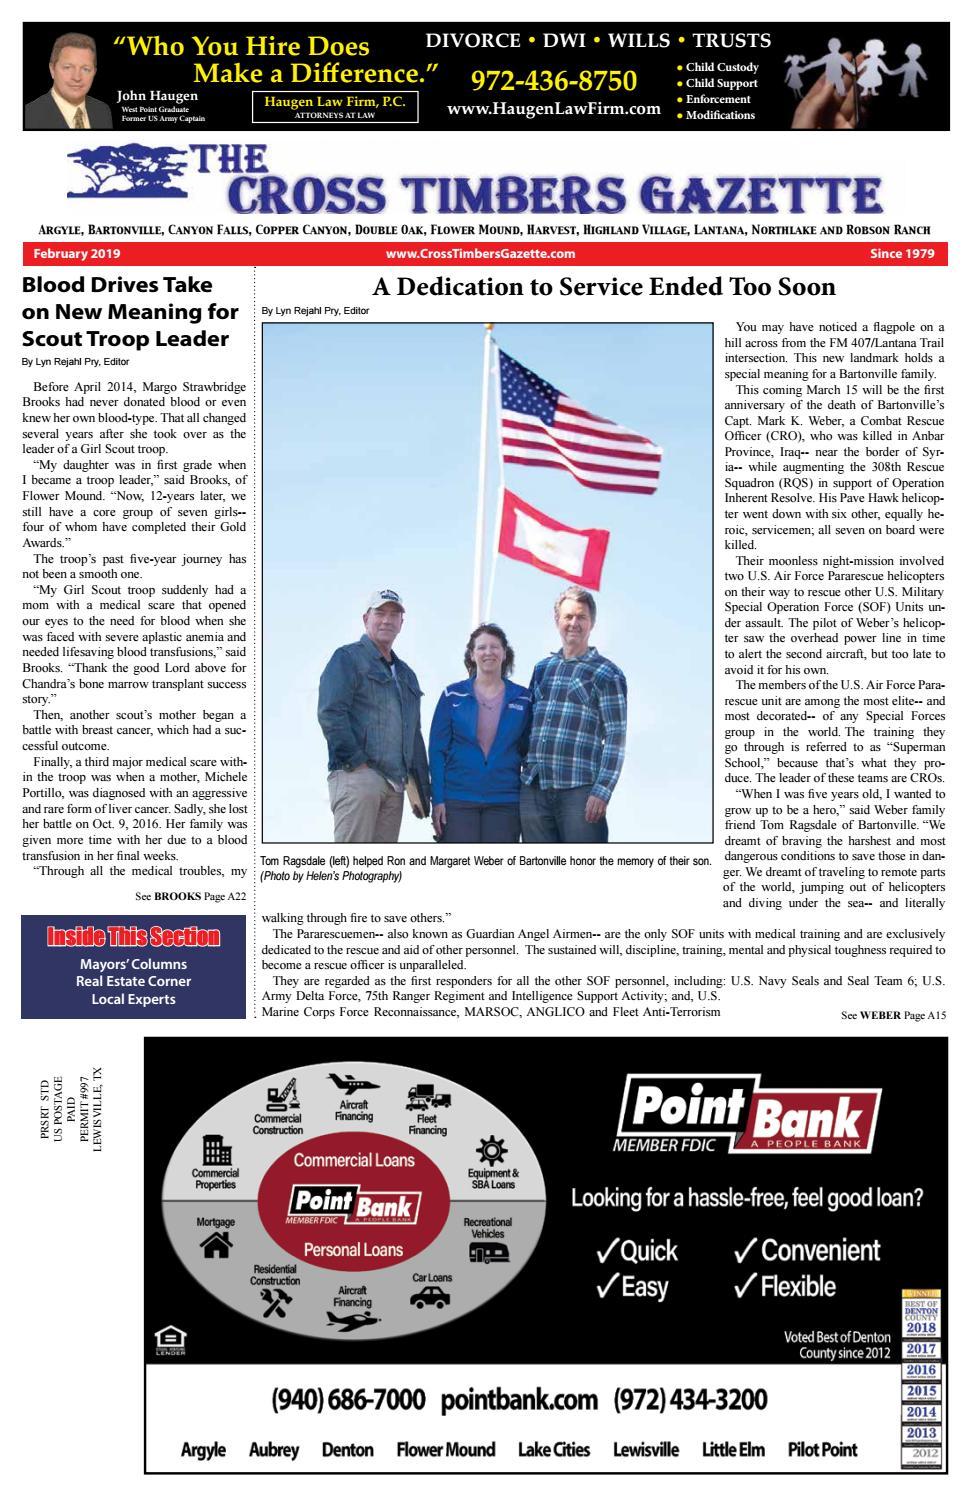 c188aada3e The Cross Timbers Gazette February 2019 by The Cross Timbers Gazette - issuu